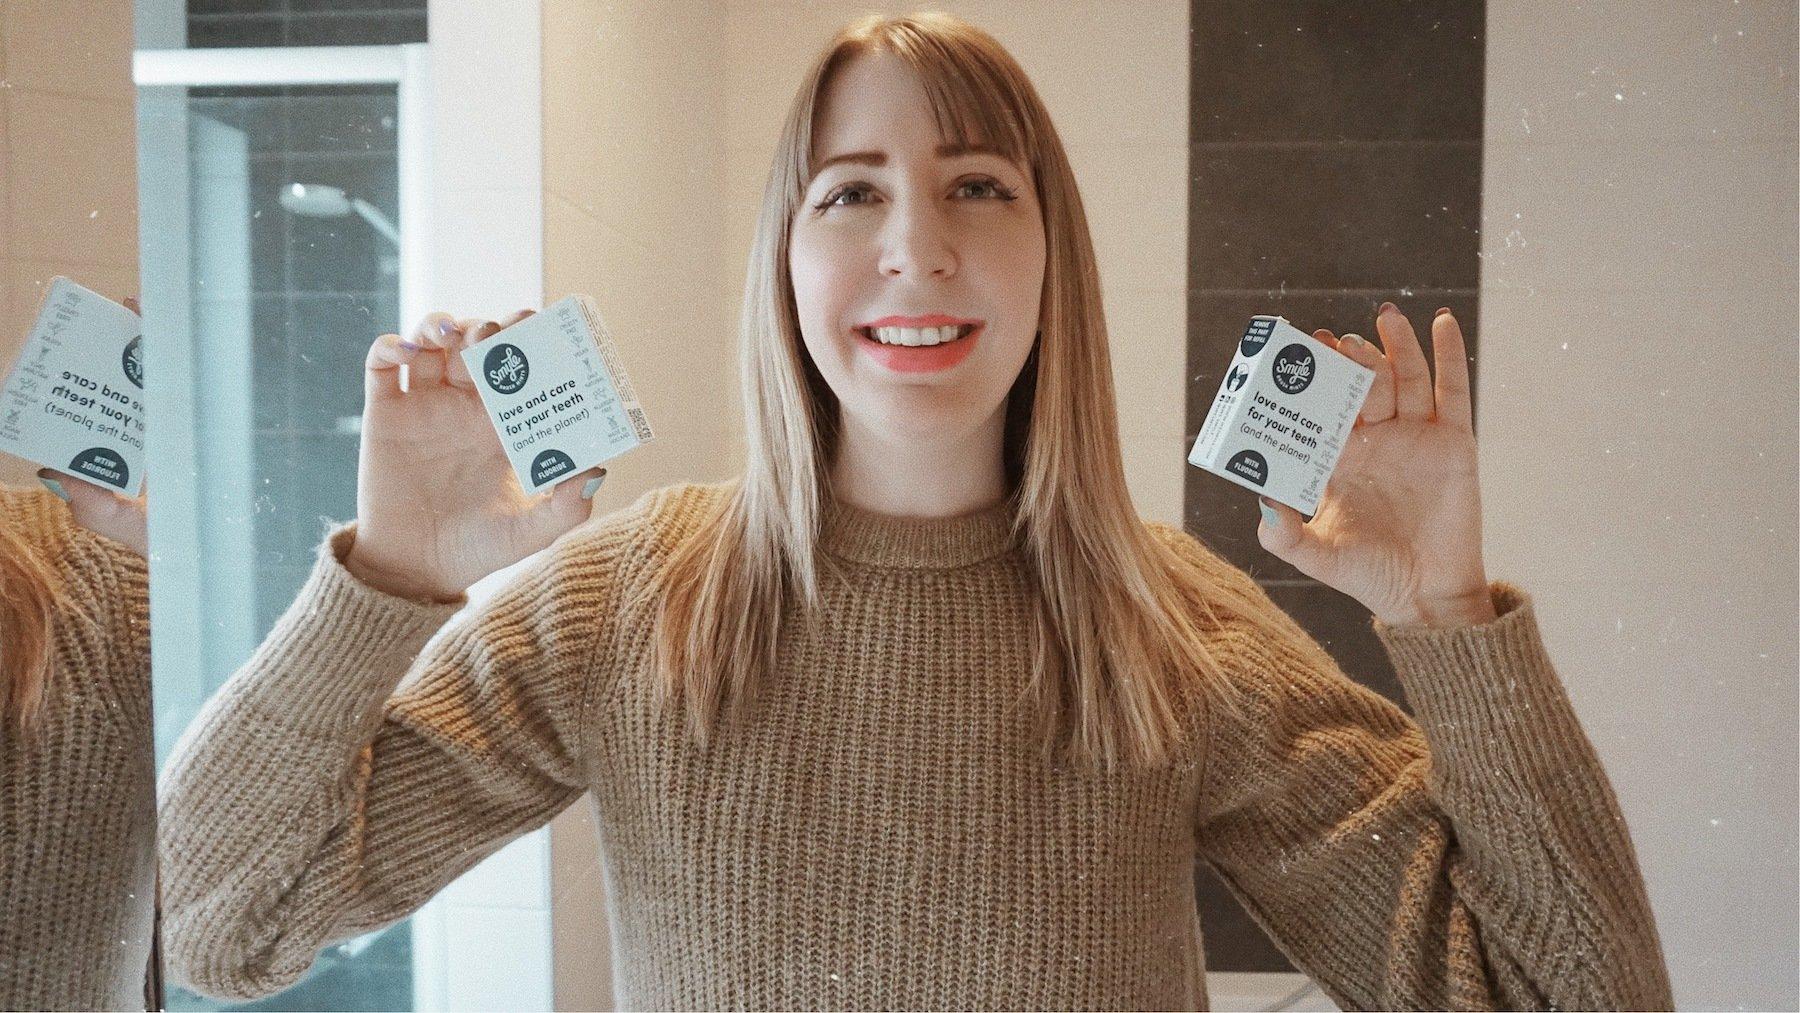 jenna minnie jennaminnie wesmyle toothpaste tablets